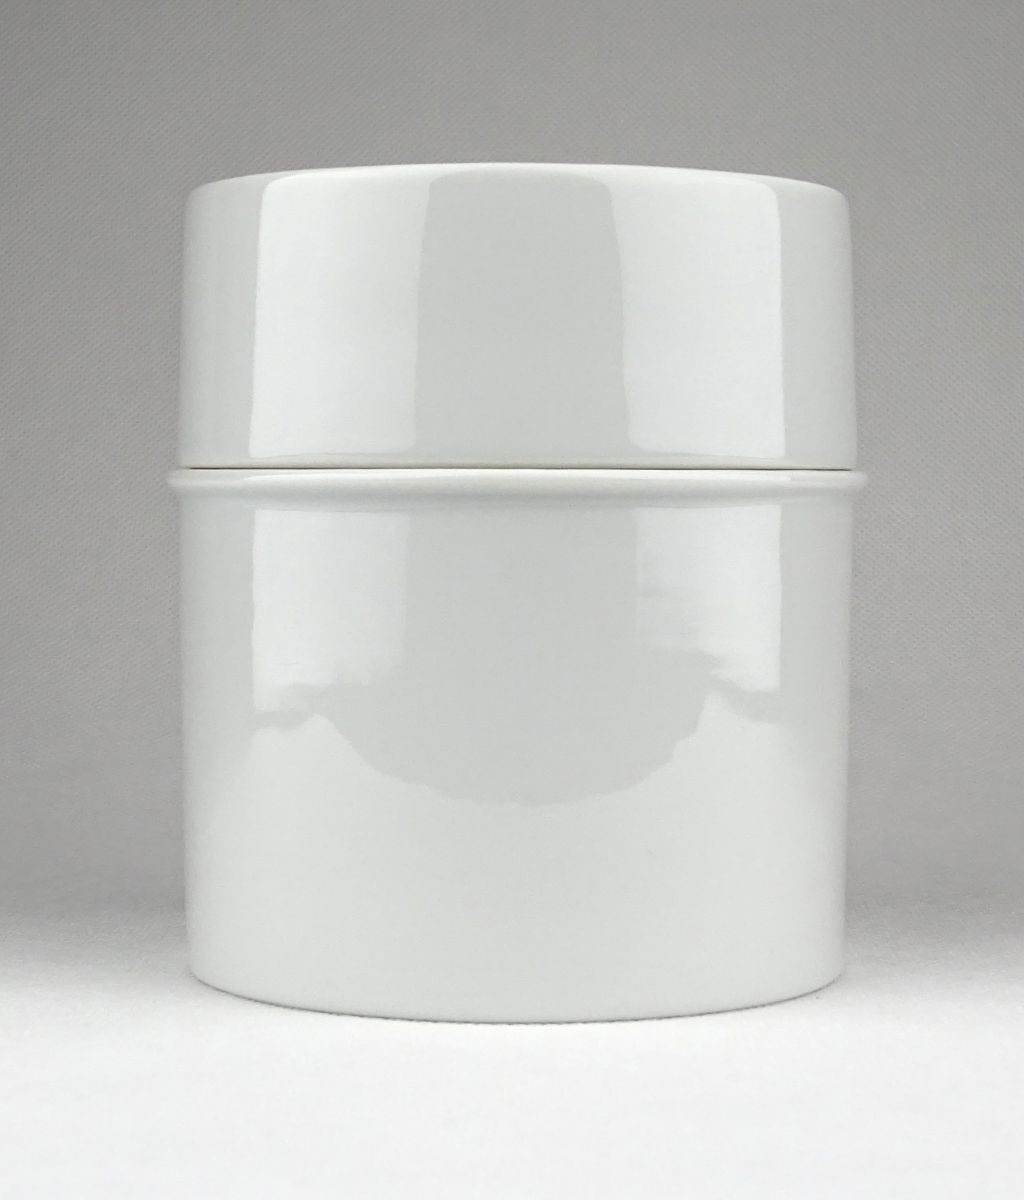 DSC05540.JPG (1024×1200)